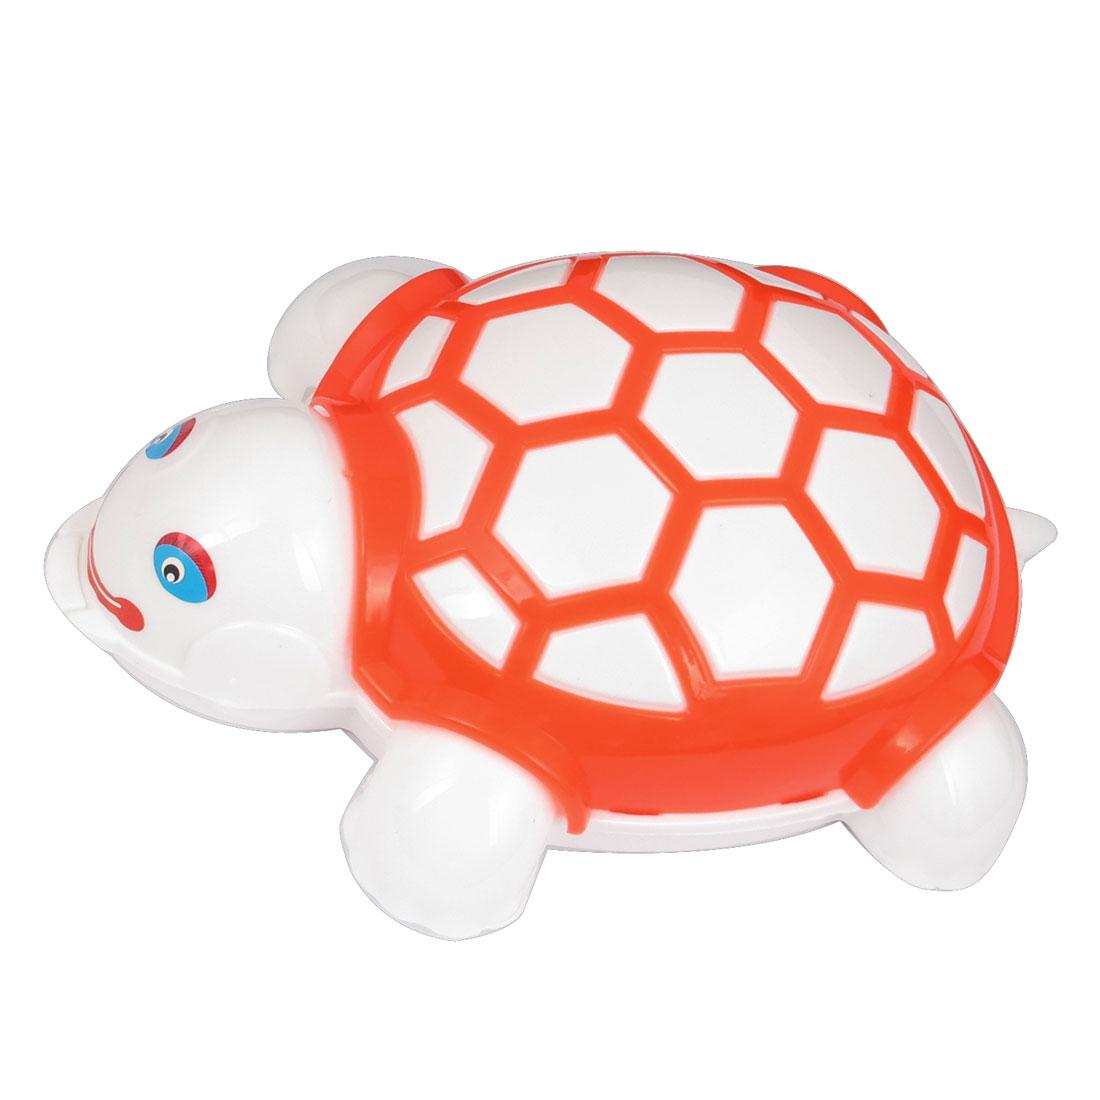 Orange Plastic Housing Tortoise Type Push Dual Rollers Carpet Cleaning Brush Cleaner